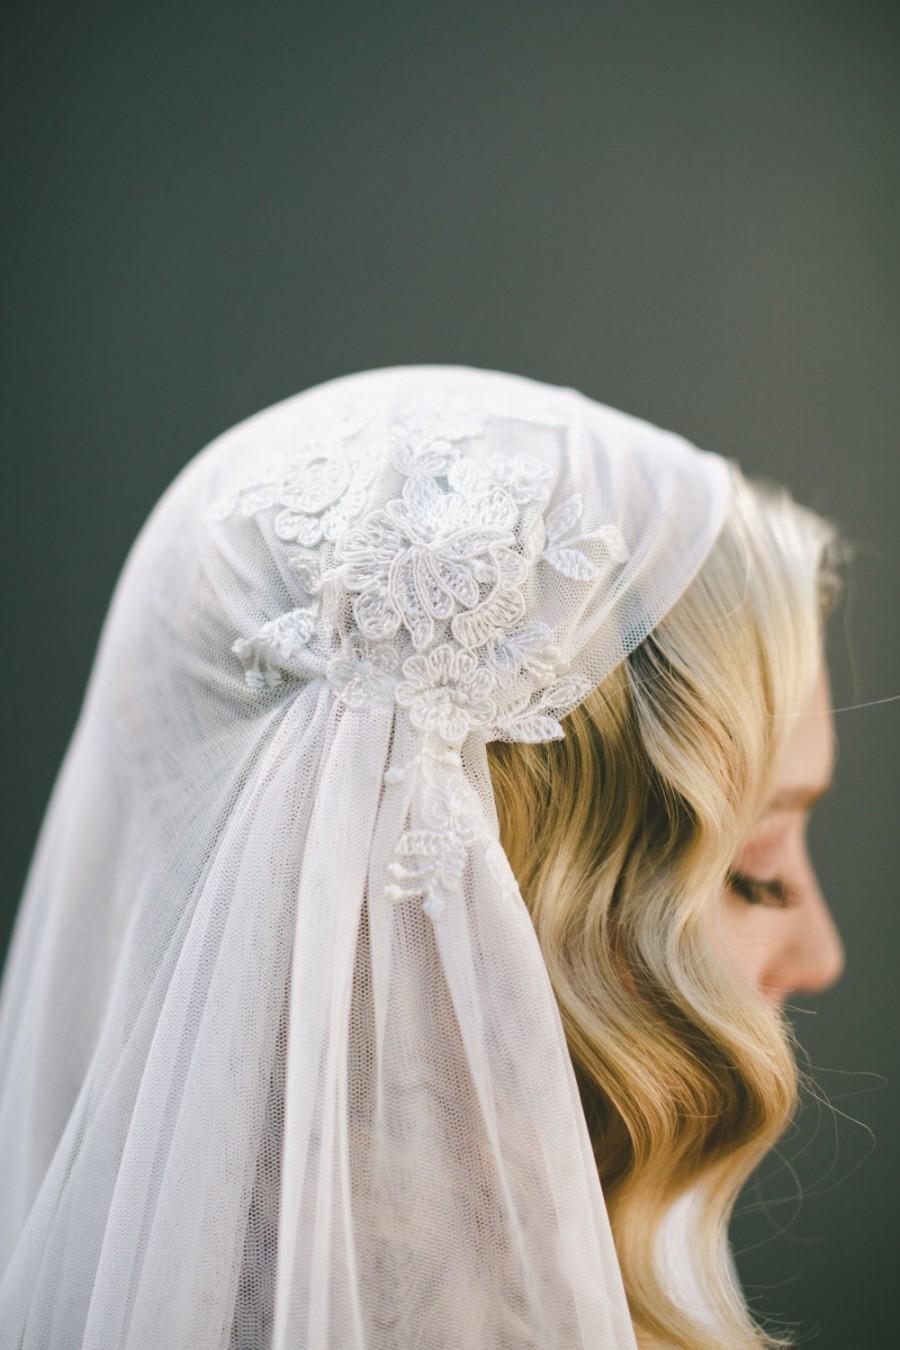 Wedding - Juliet Cap Veil-Eyelash Fringe Lace-1920s Headpiece-English Net Veil-Gatsby Headpiece-Halo Crown-Bohemian Crown-Boho Veil-Veiled Beauty 1519